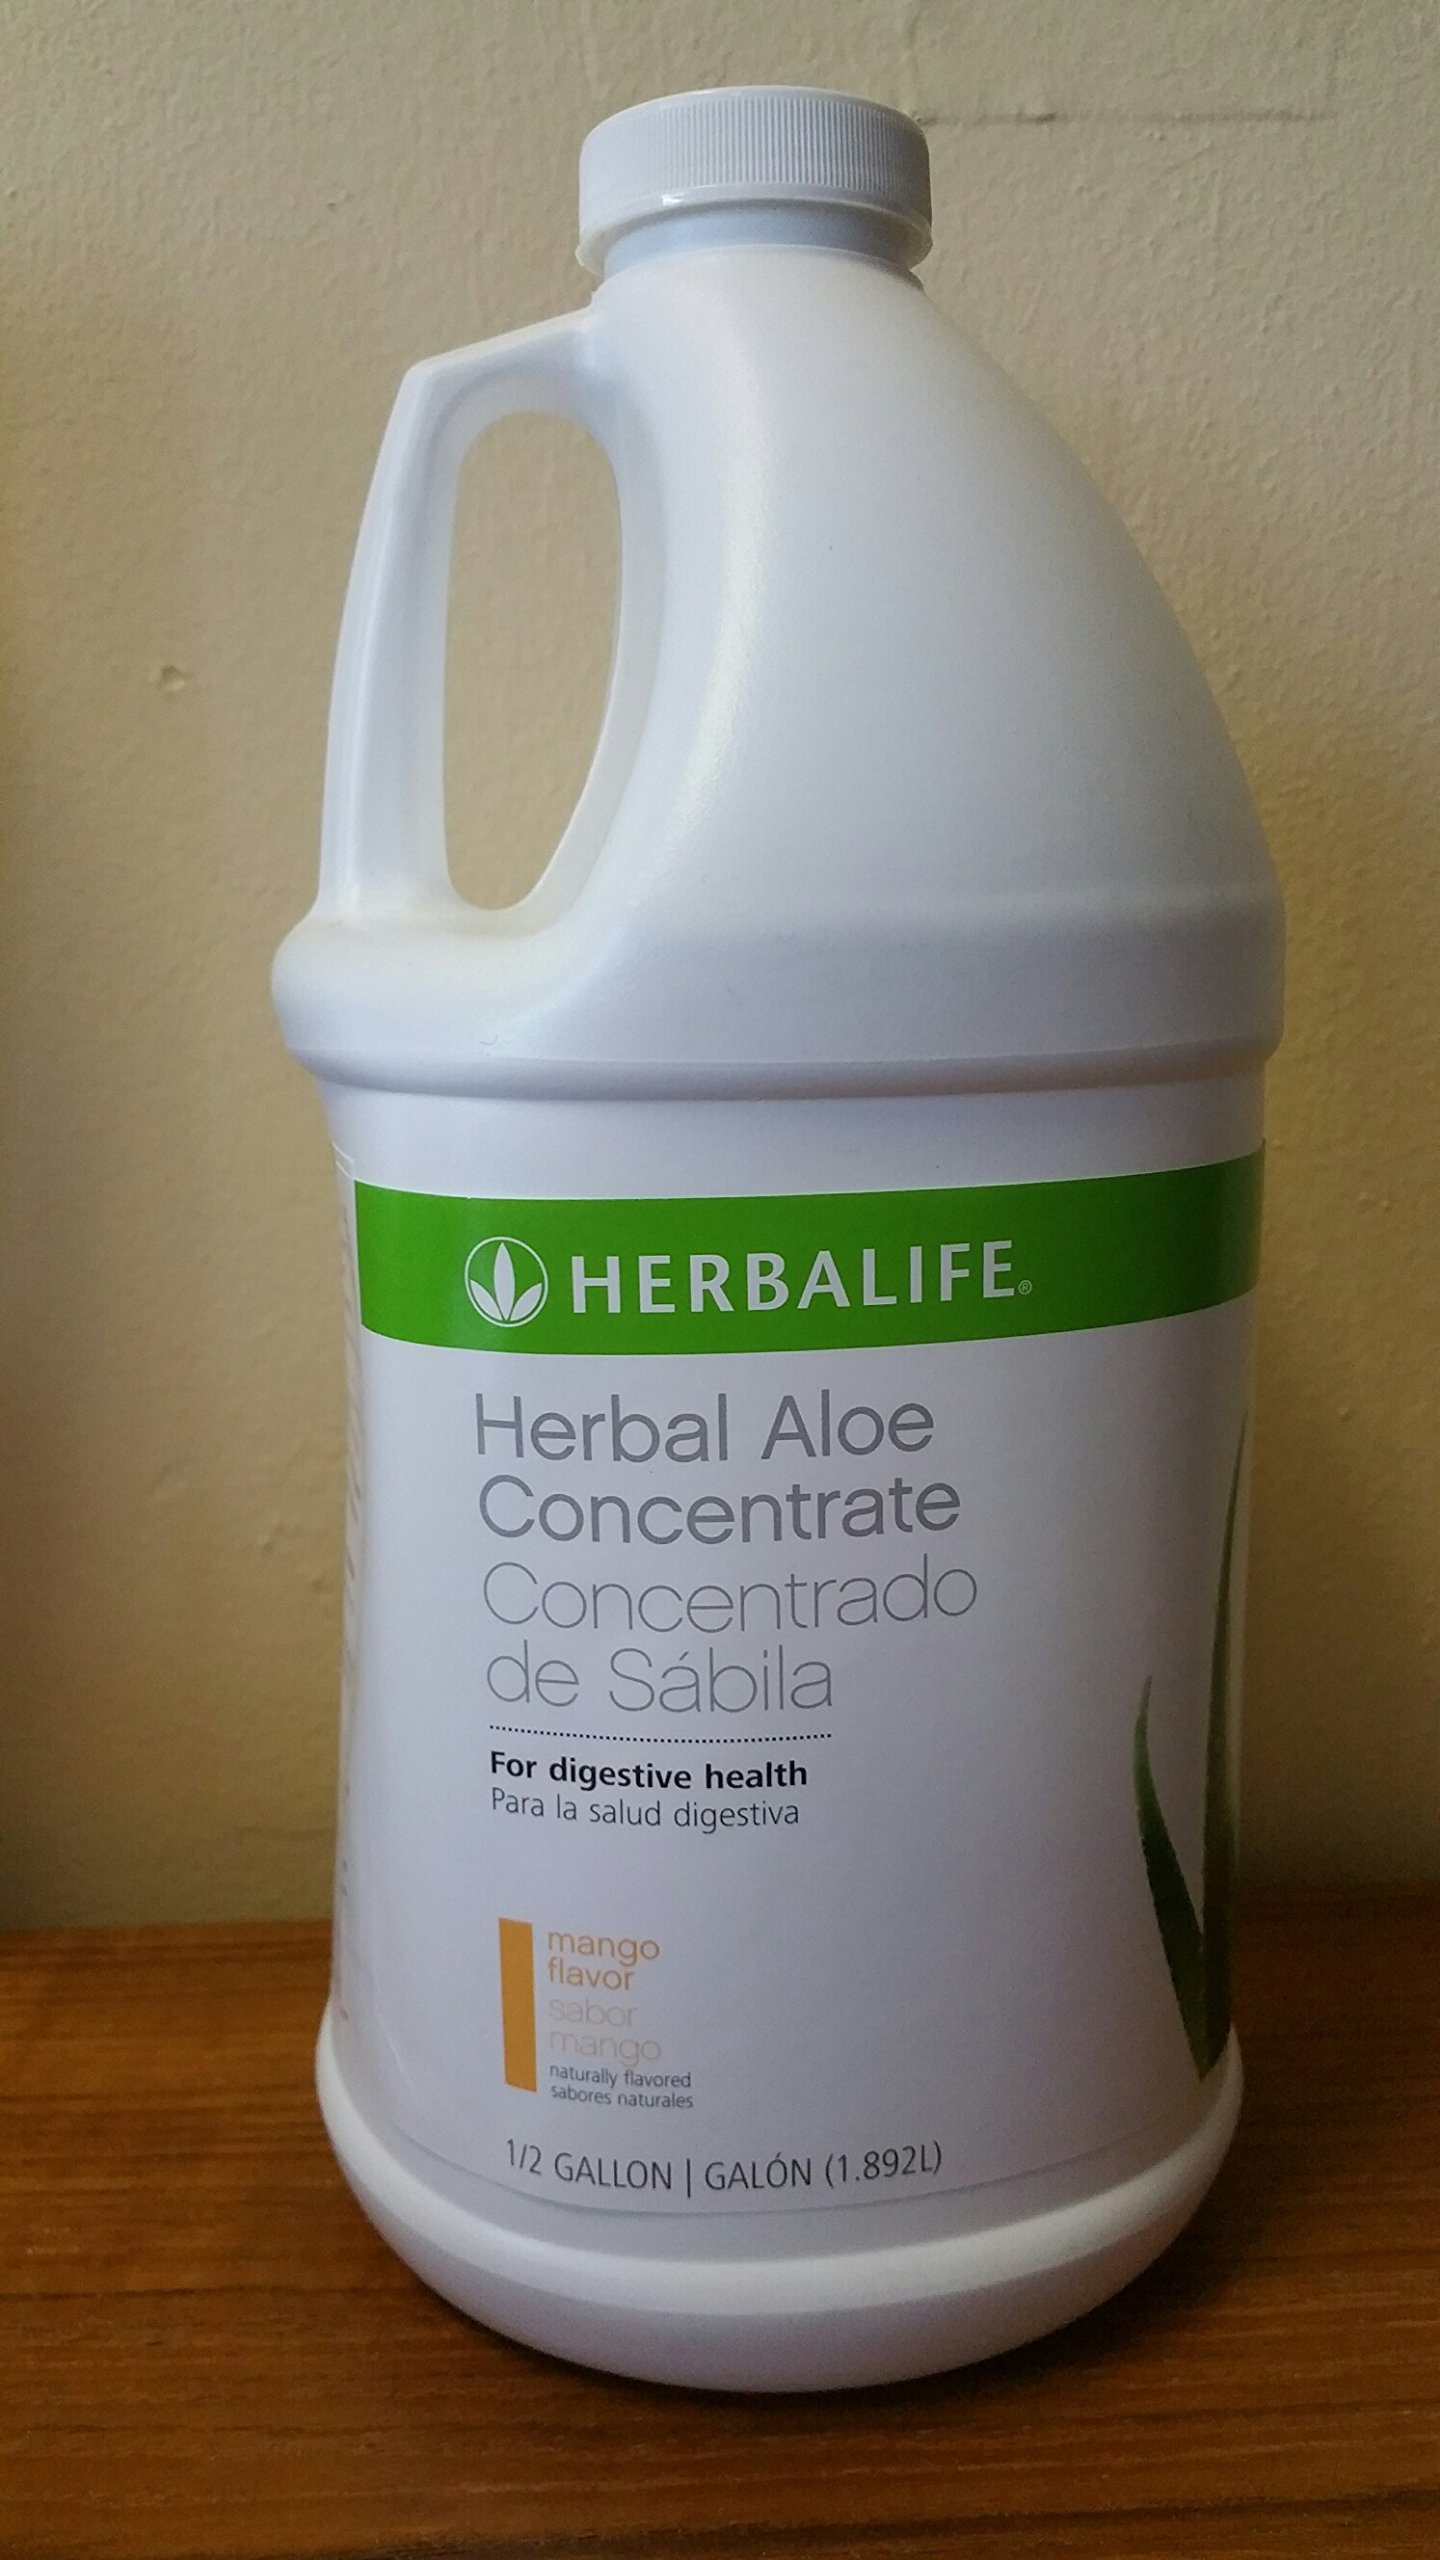 Herbalife Herbal Aloe Concentrate - Mango, Half Gallon